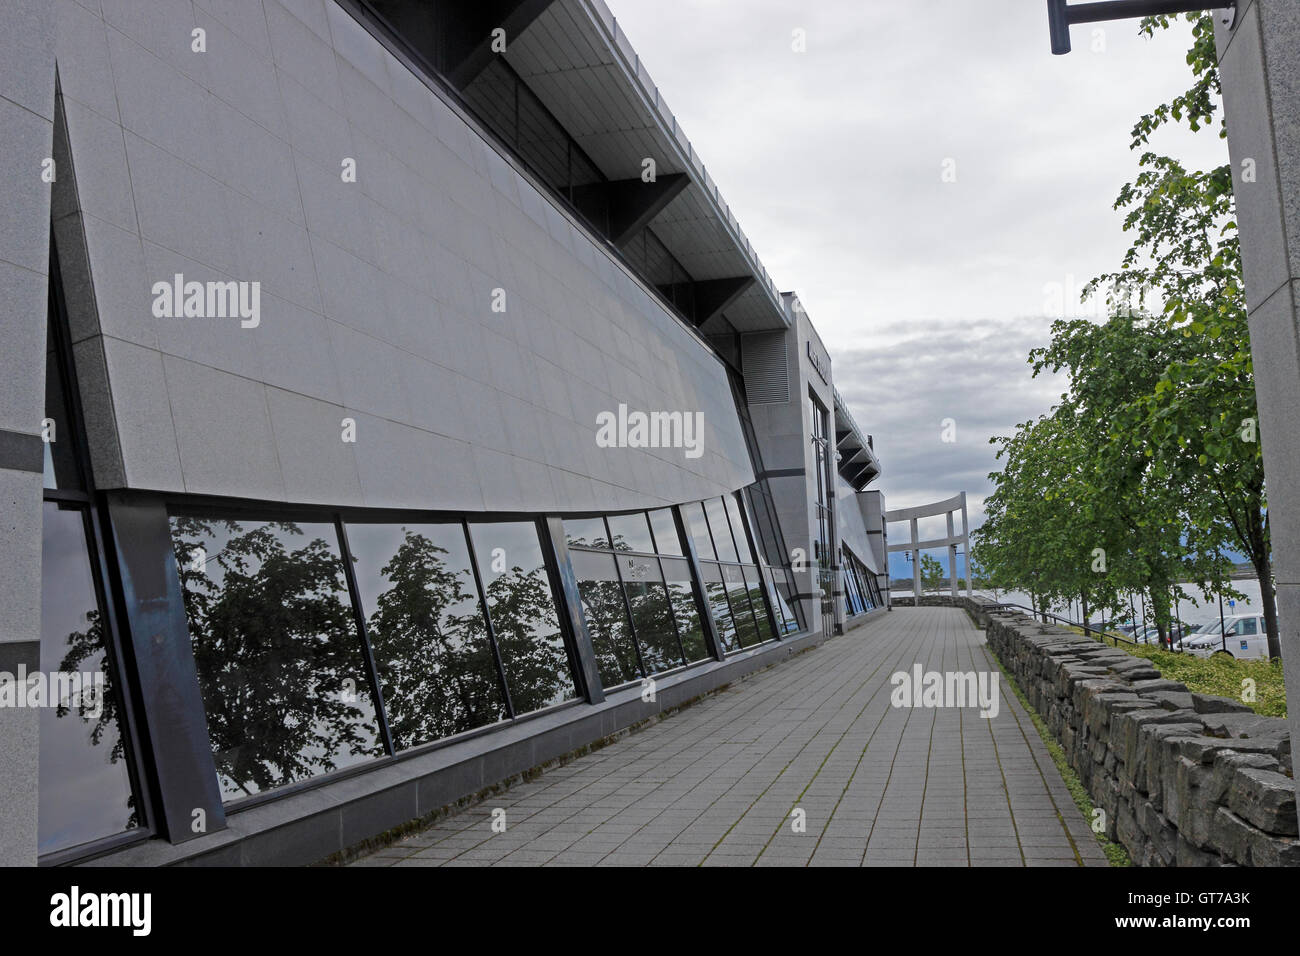 Aker football stadium Molde, Norway - Stock Image